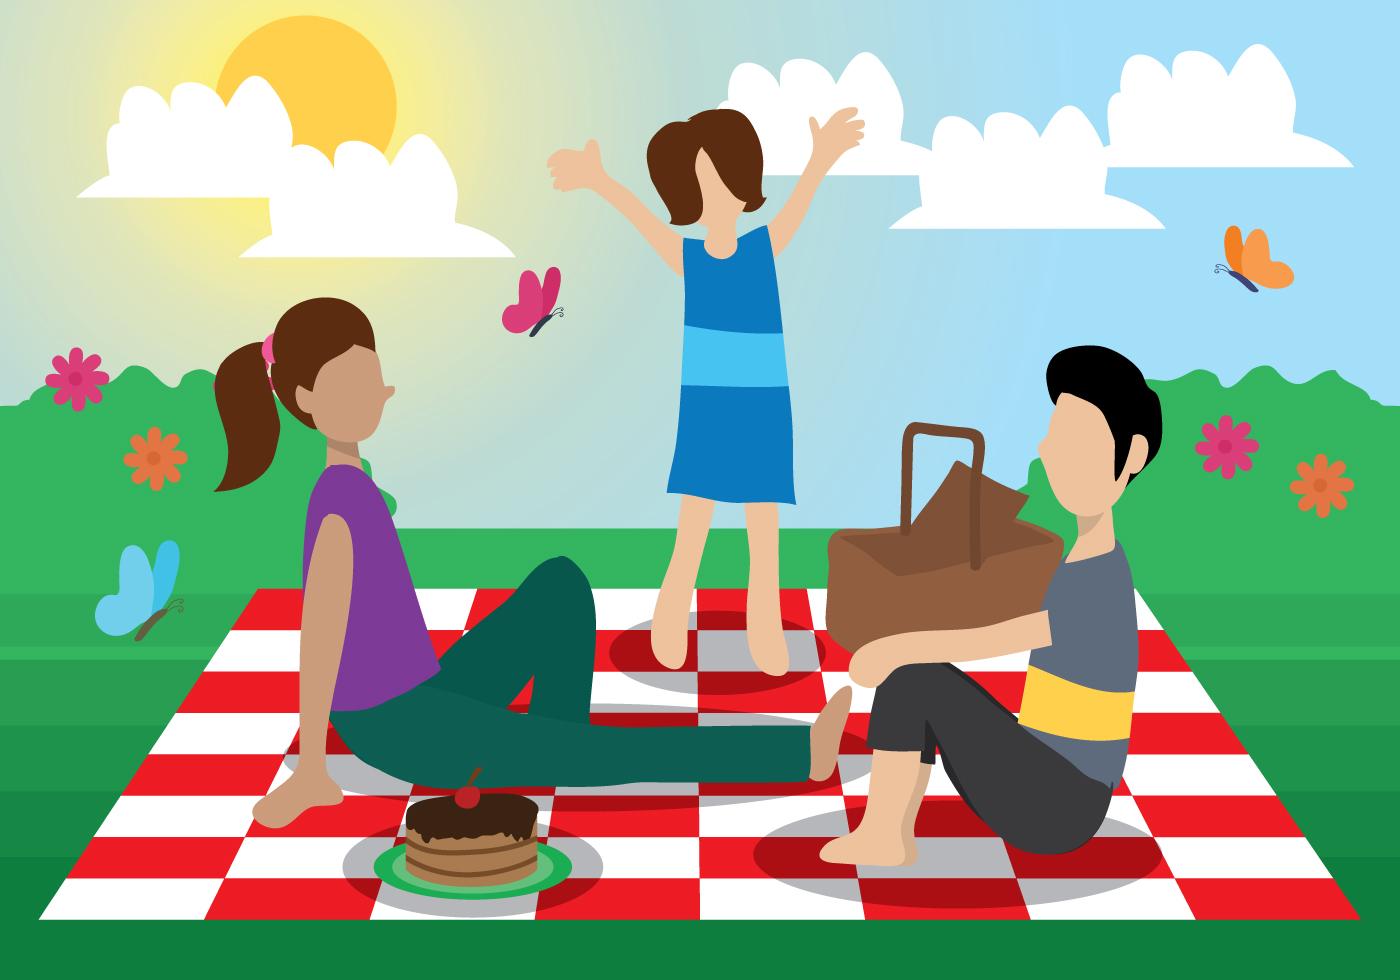 Family Picnic Vector Download Free Vector Art Stock